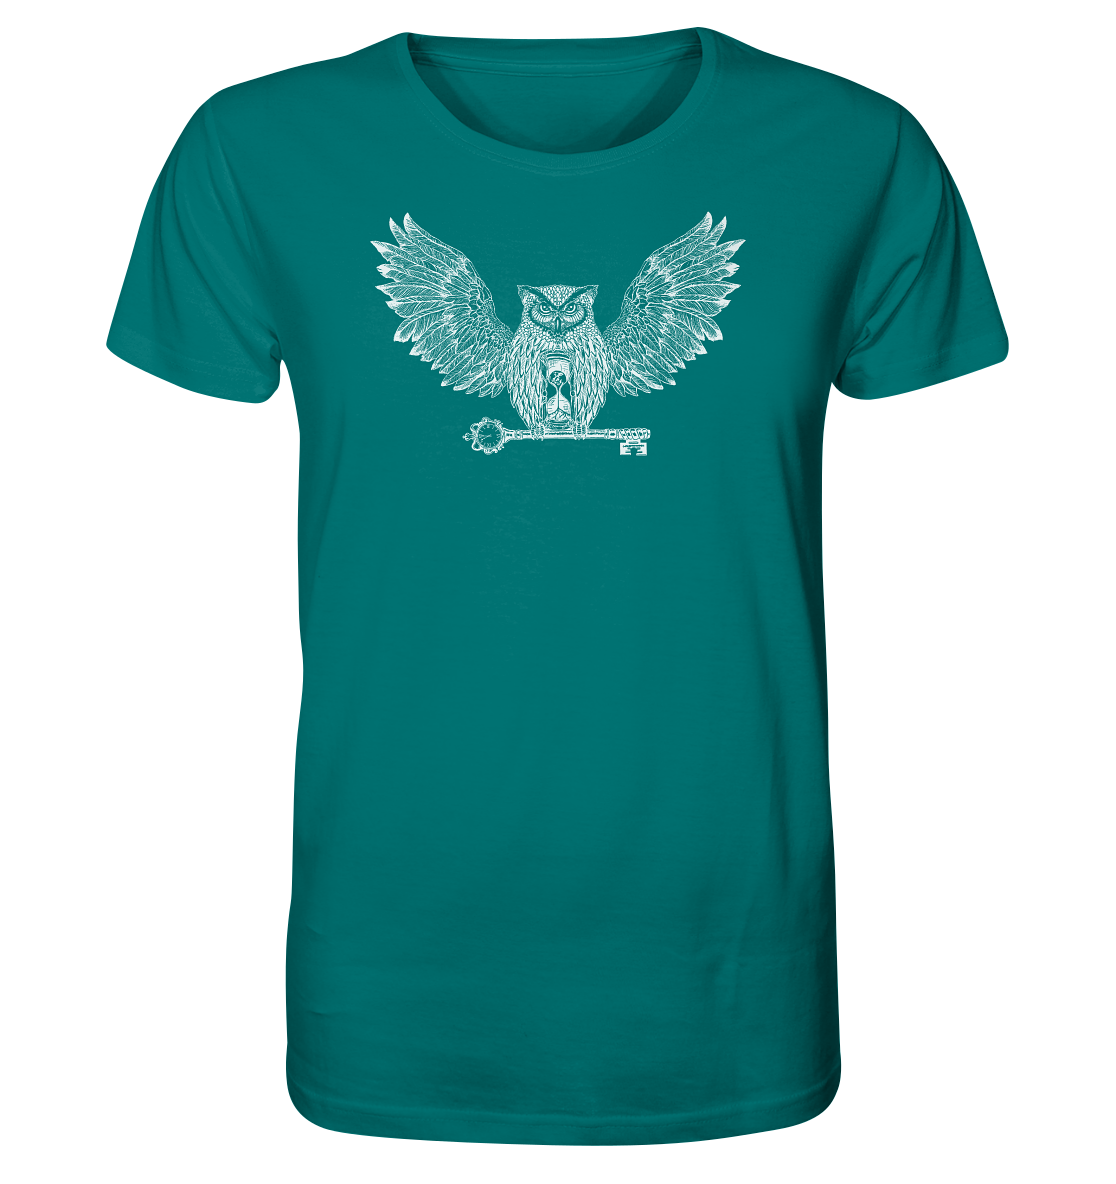 front-organic-shirt-007373-1116x-9.png